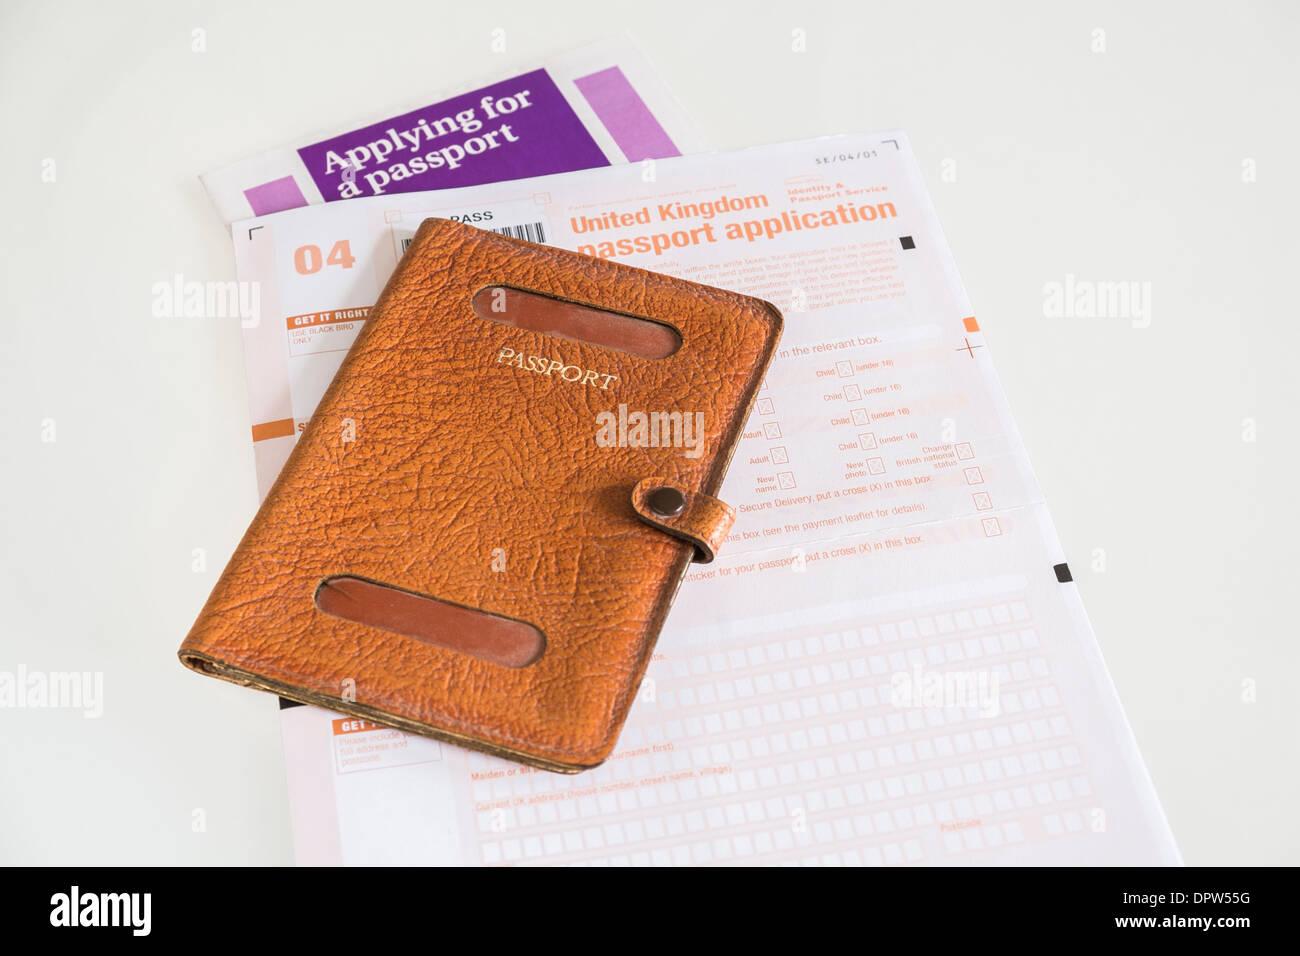 Uk passport application form and empty passport holder stock photo uk passport application form and empty passport holder falaconquin